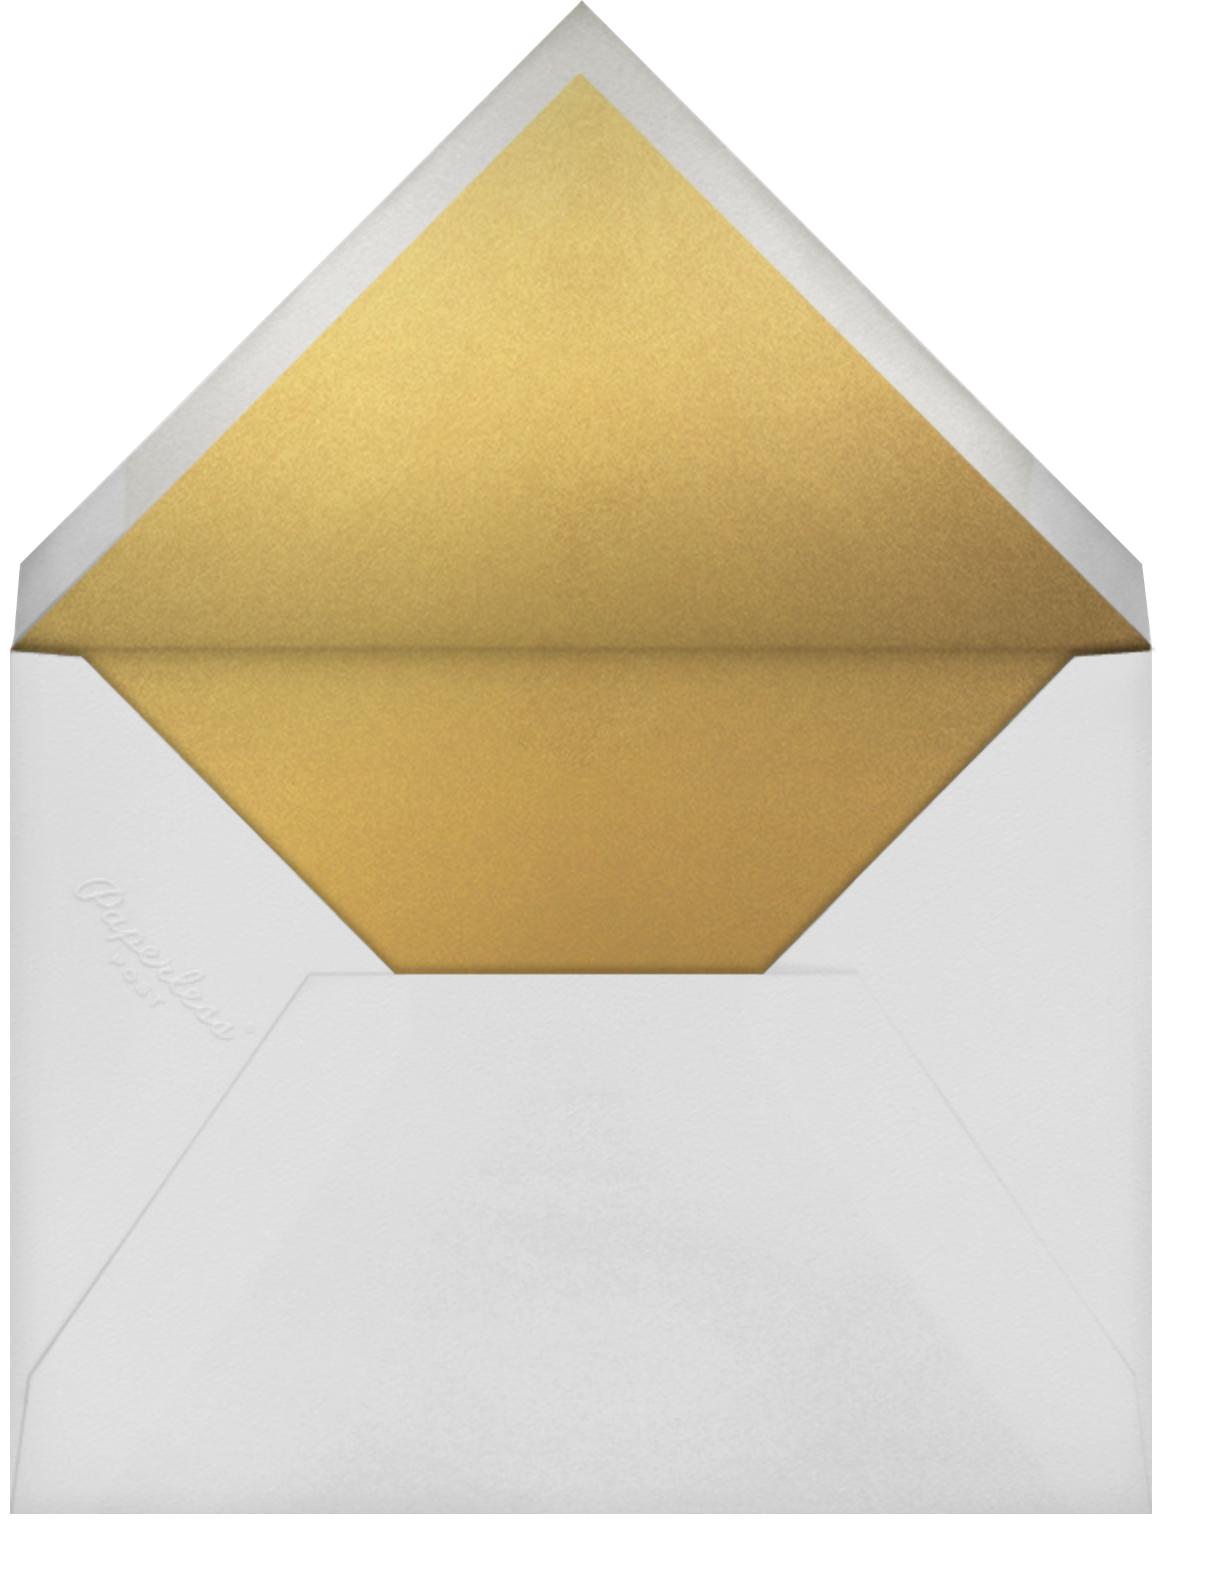 Inner Circle - Paperless Post - Photo  - envelope back